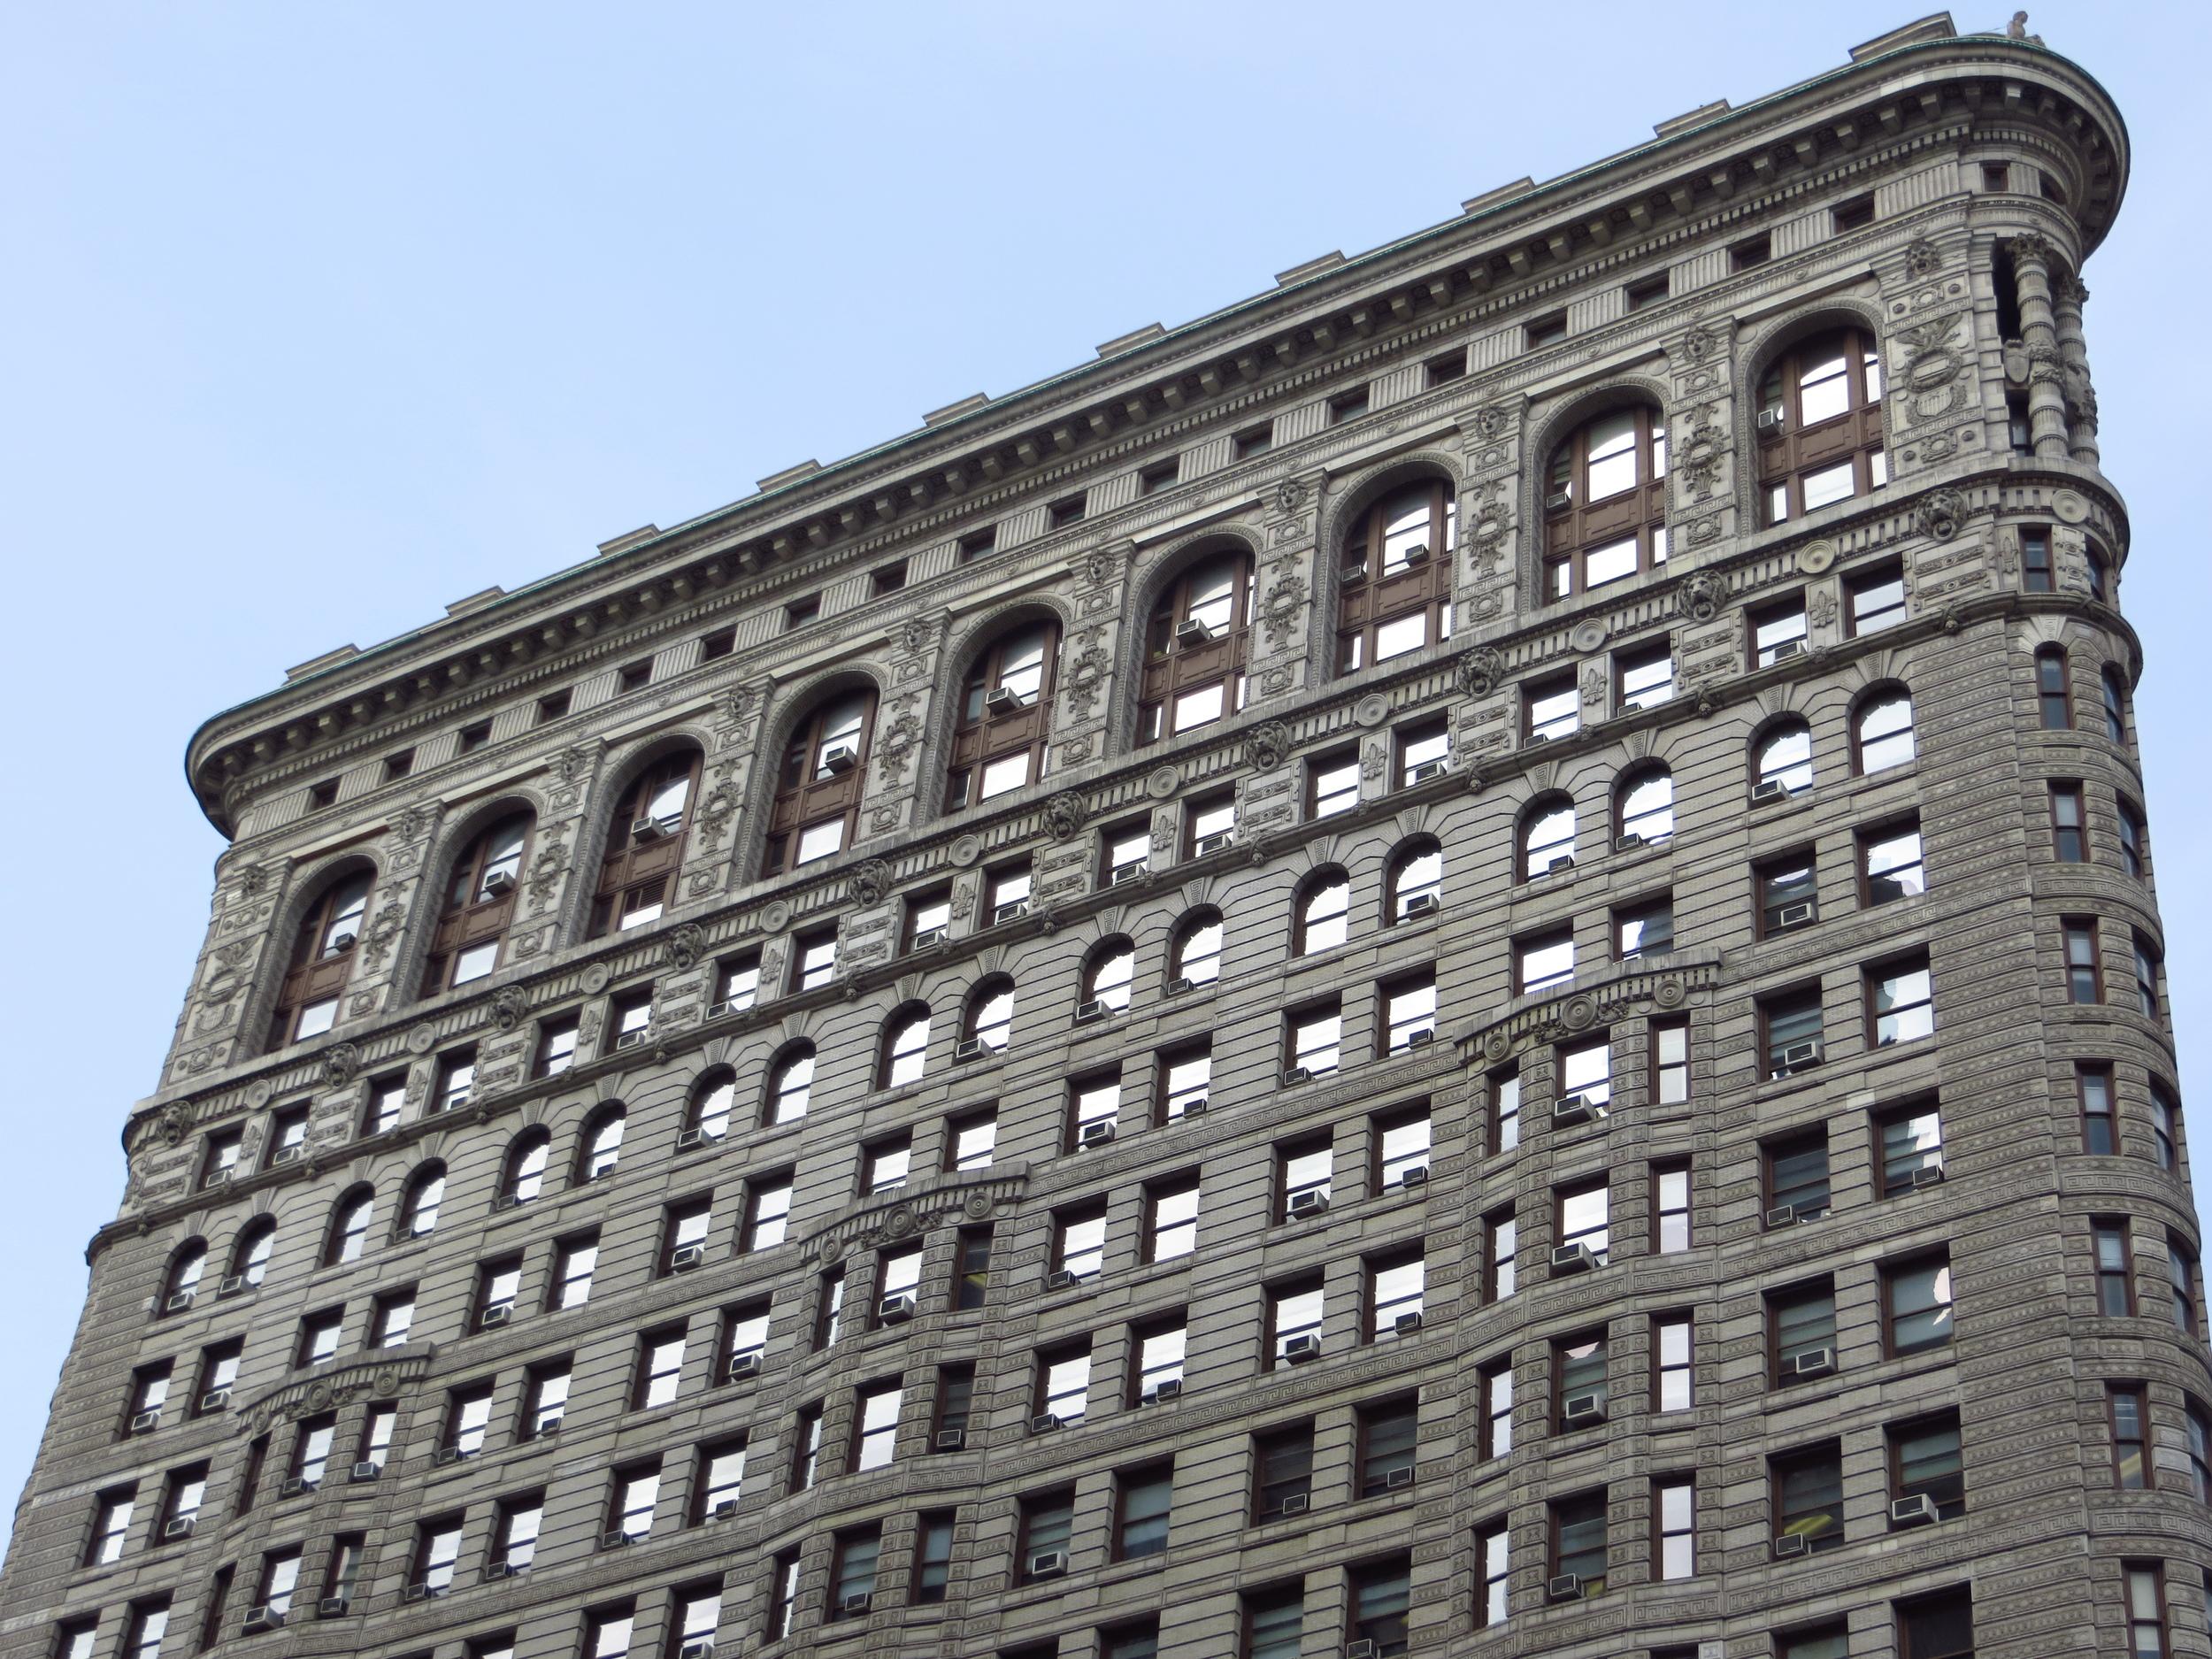 Side of Flatiron Building